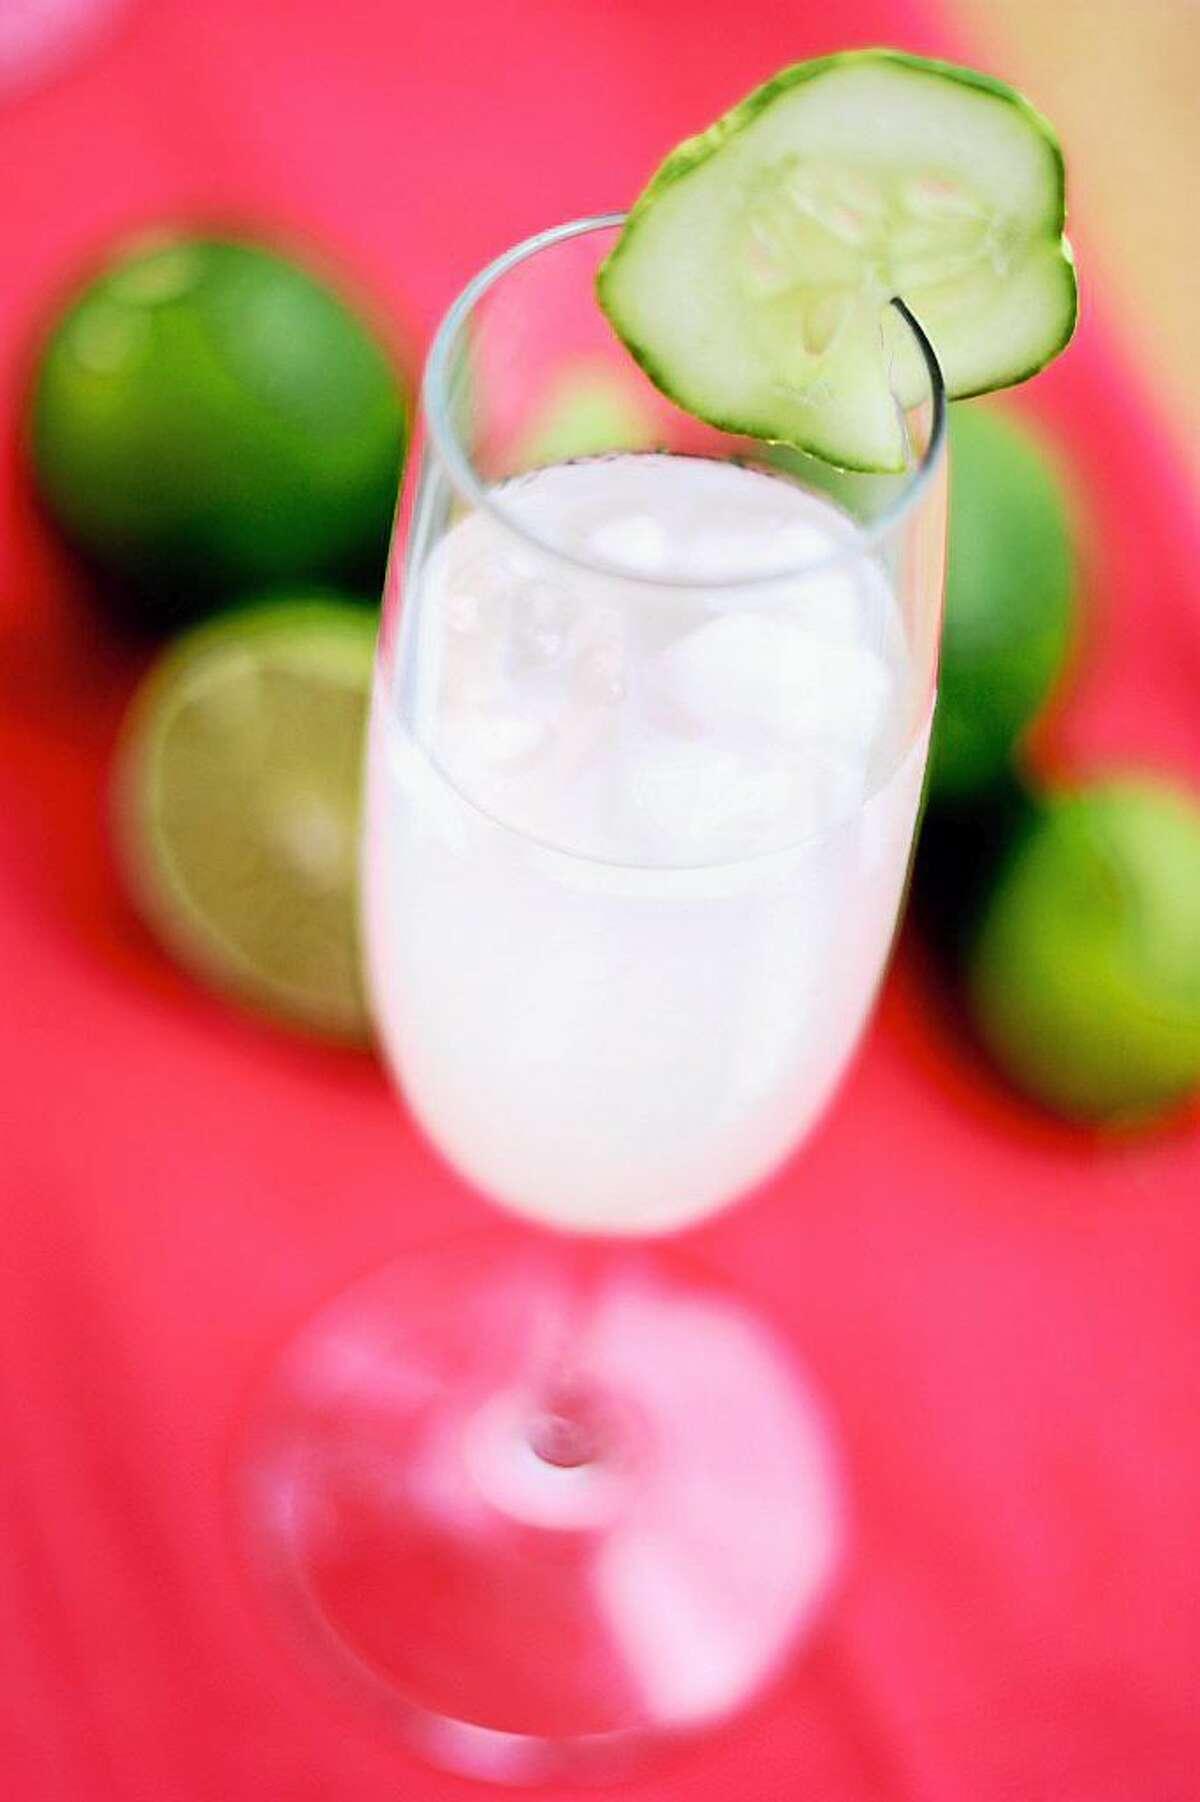 Middletown's vegan eatery I.O.N. Restaurant shares its Lime-Mint Spritzer recipe.